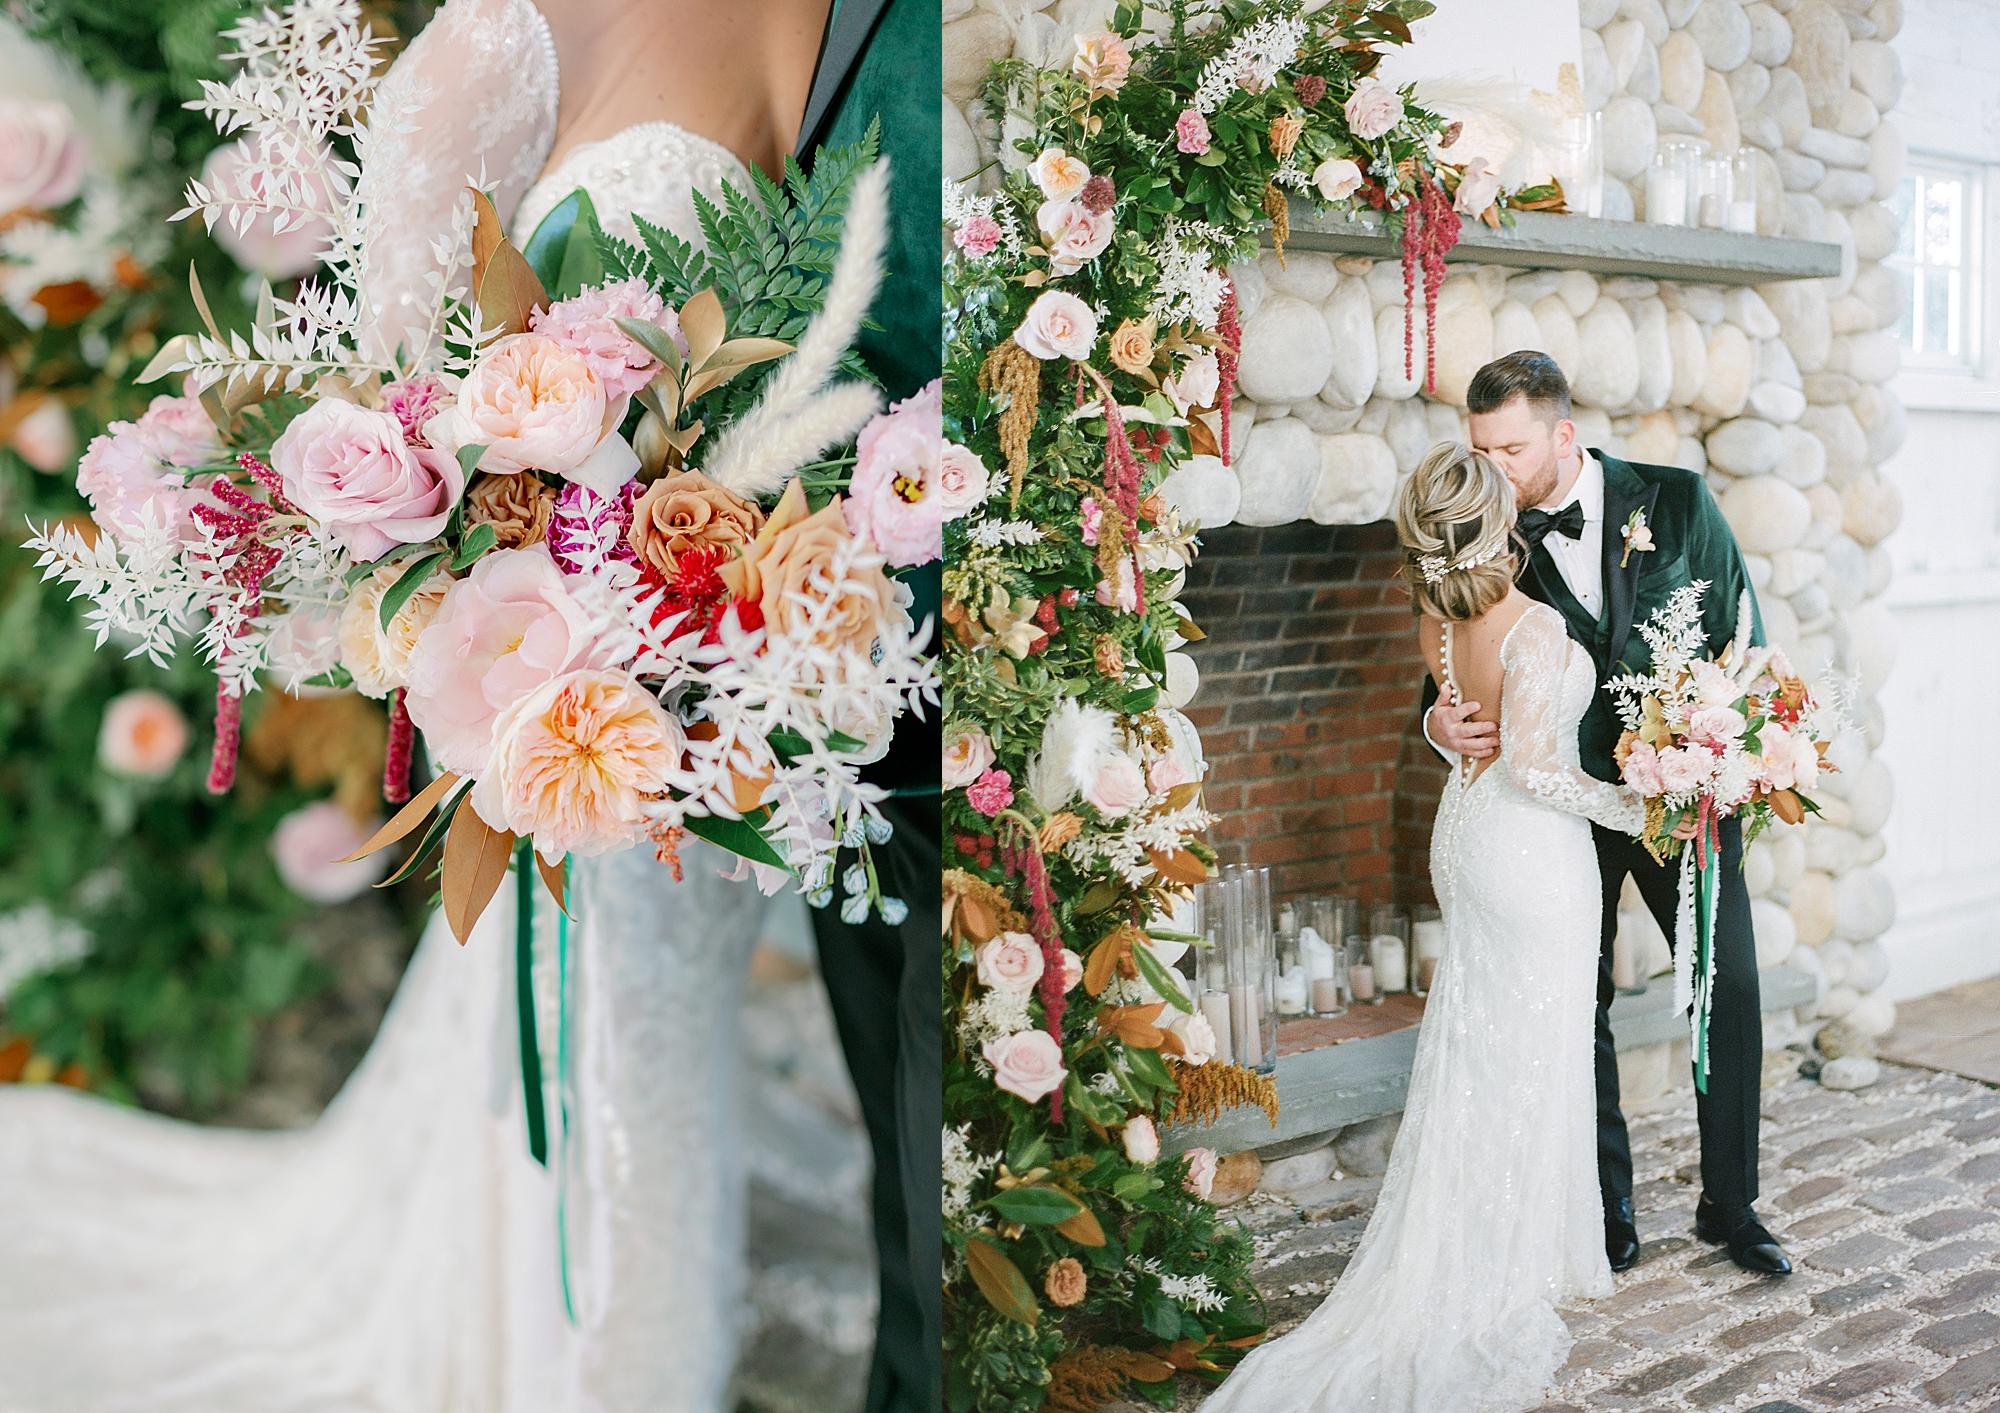 Bonnet Island Estate Film Wedding Photography by Magdalena Studios 0029